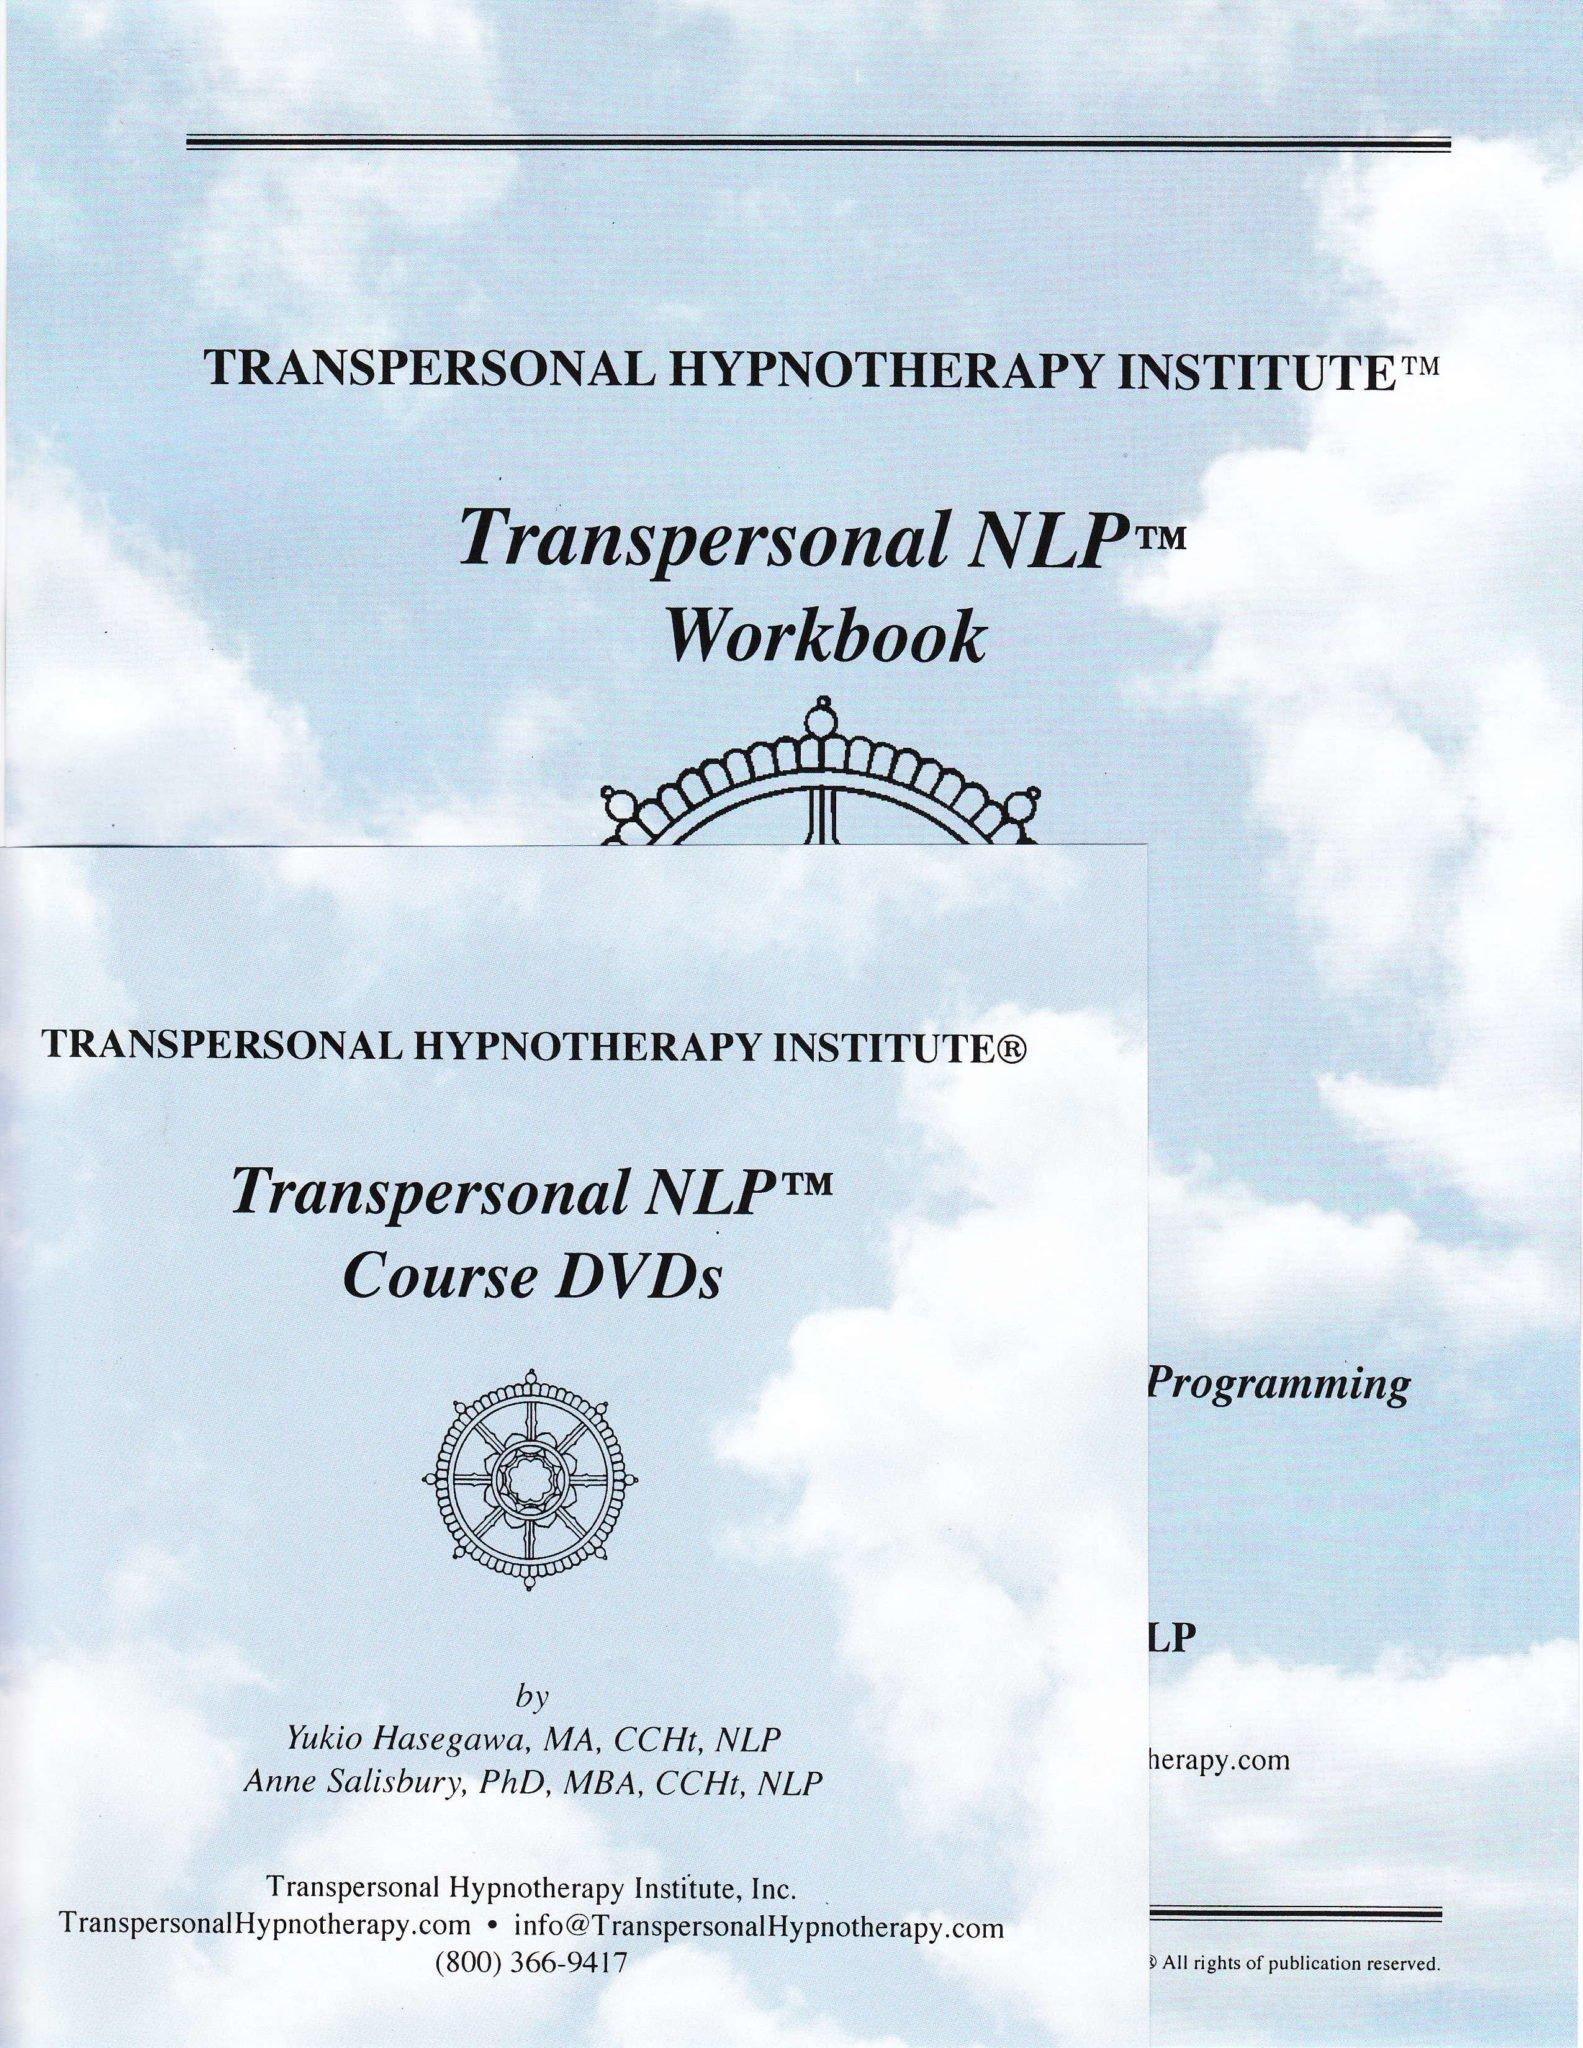 Transpersonal NLP (Neuro-linguistic Programming) Course